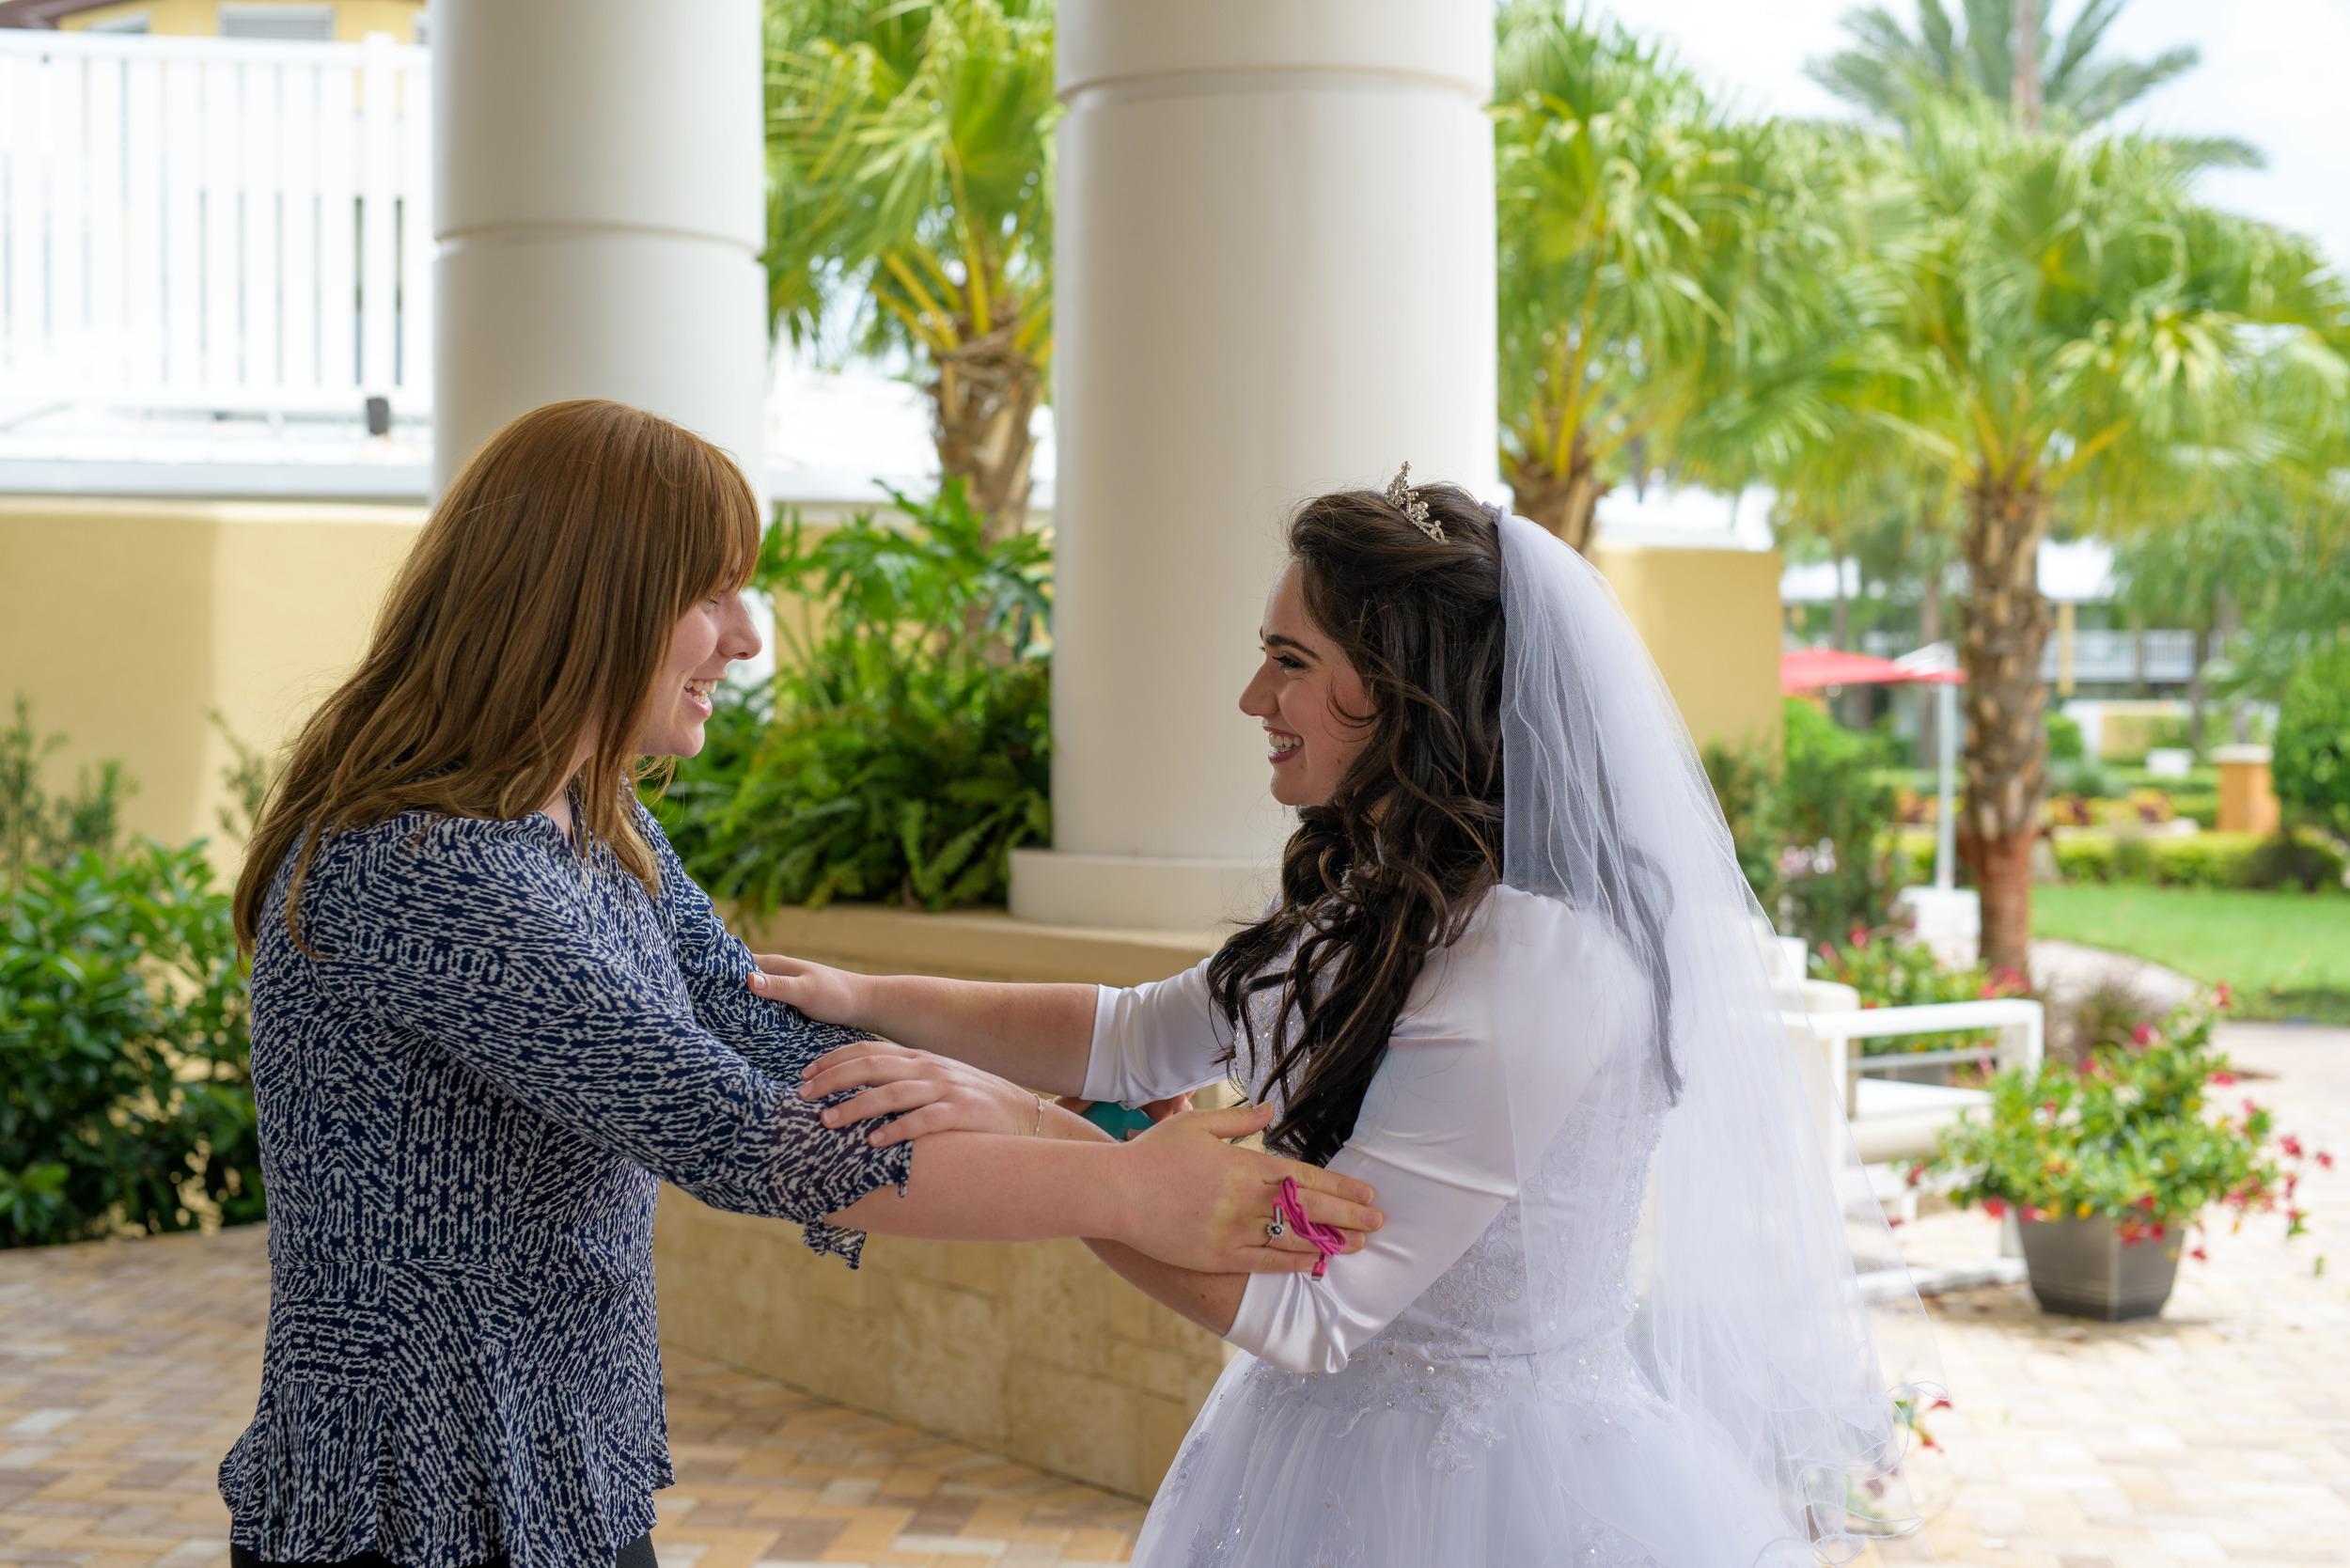 Wedding by Levikfoto.com-012.jpg